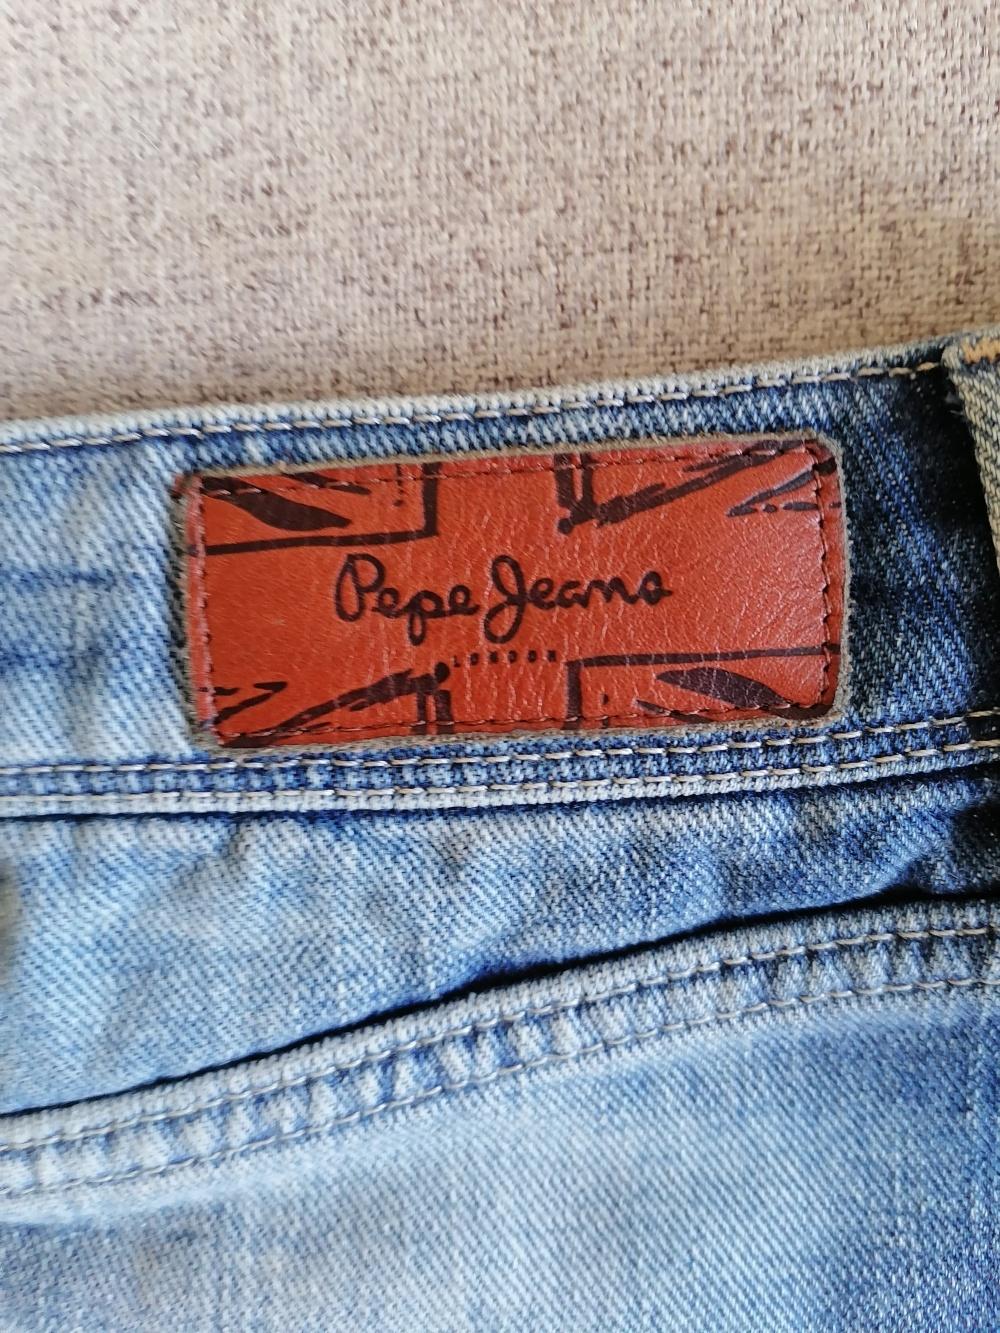 Юбка Pepe Jeans, размер 29